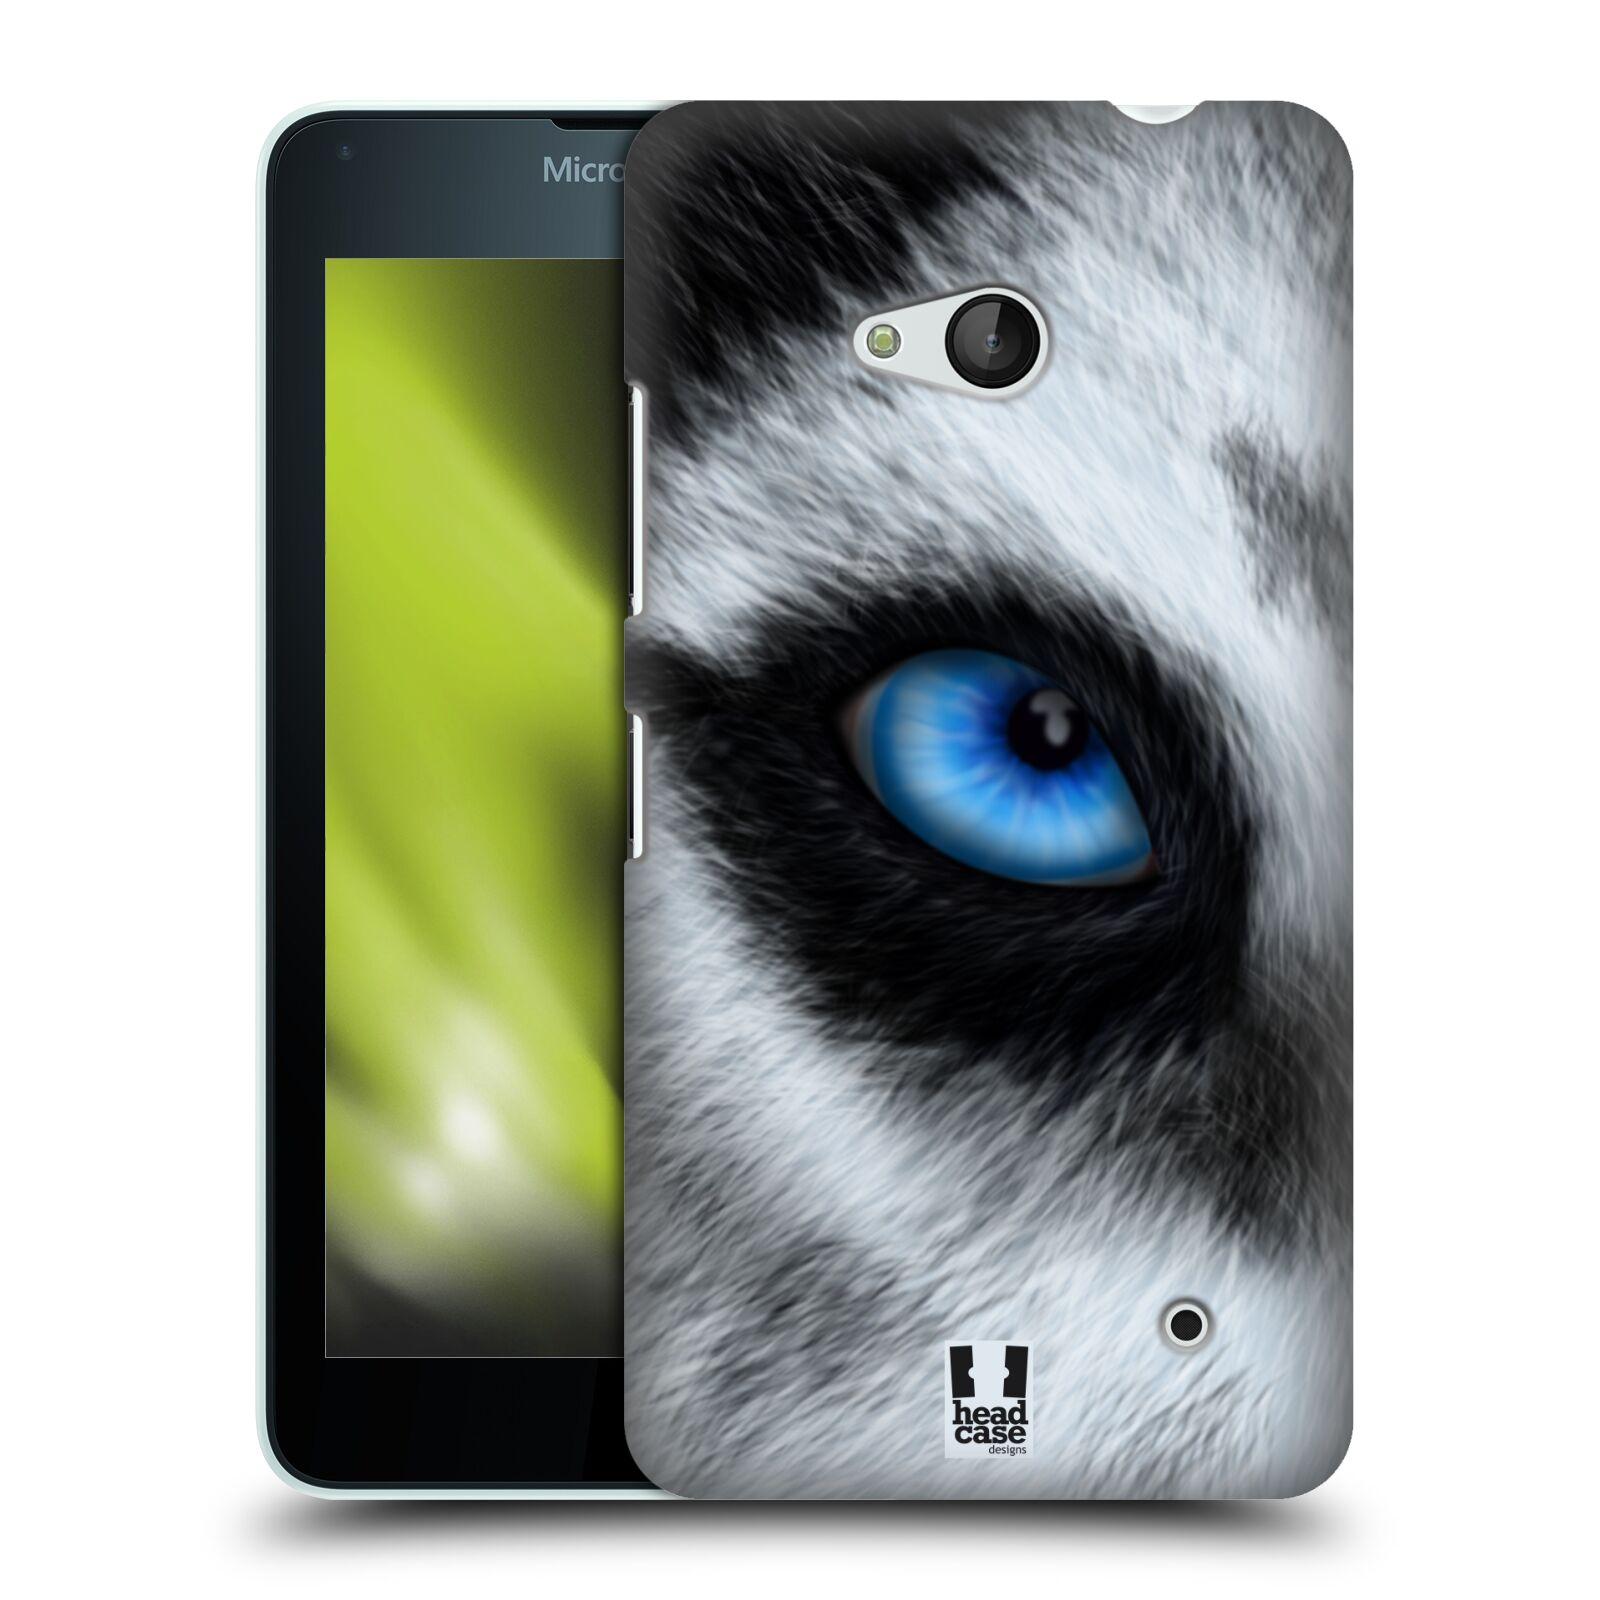 HEAD CASE plastový obal na mobil Nokia Lumia 640 vzor pohled zvířete oko pes husky